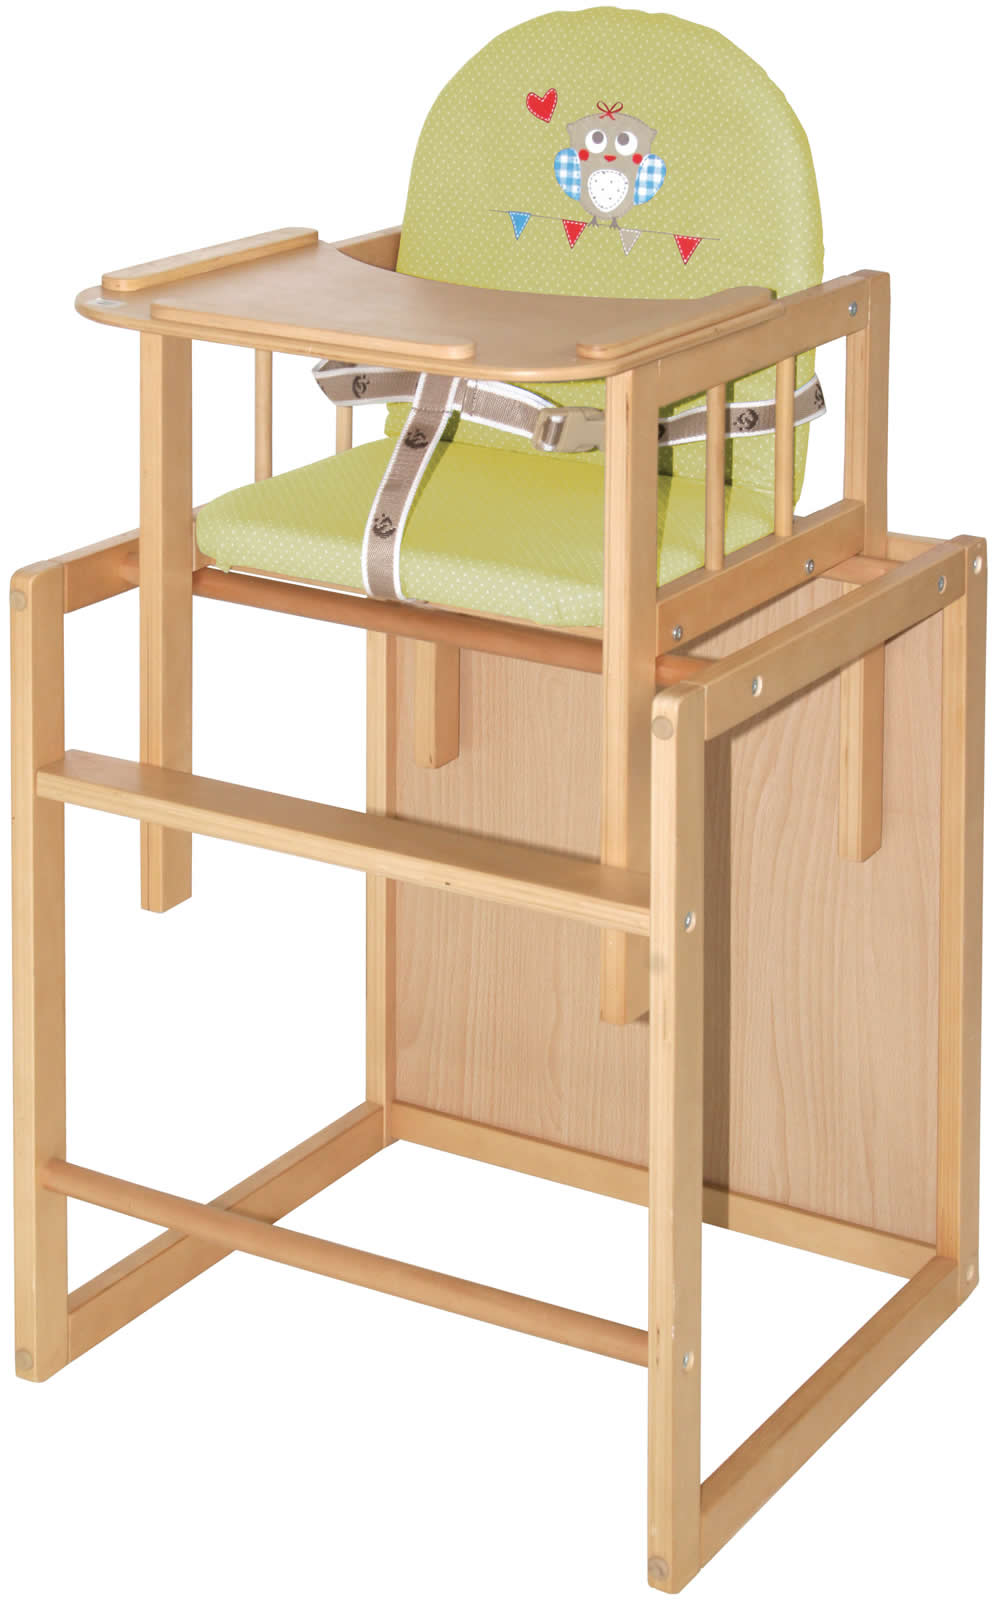 roba kombihochstuhl hochstuhl kinderhochstuhl holz ro7512. Black Bedroom Furniture Sets. Home Design Ideas